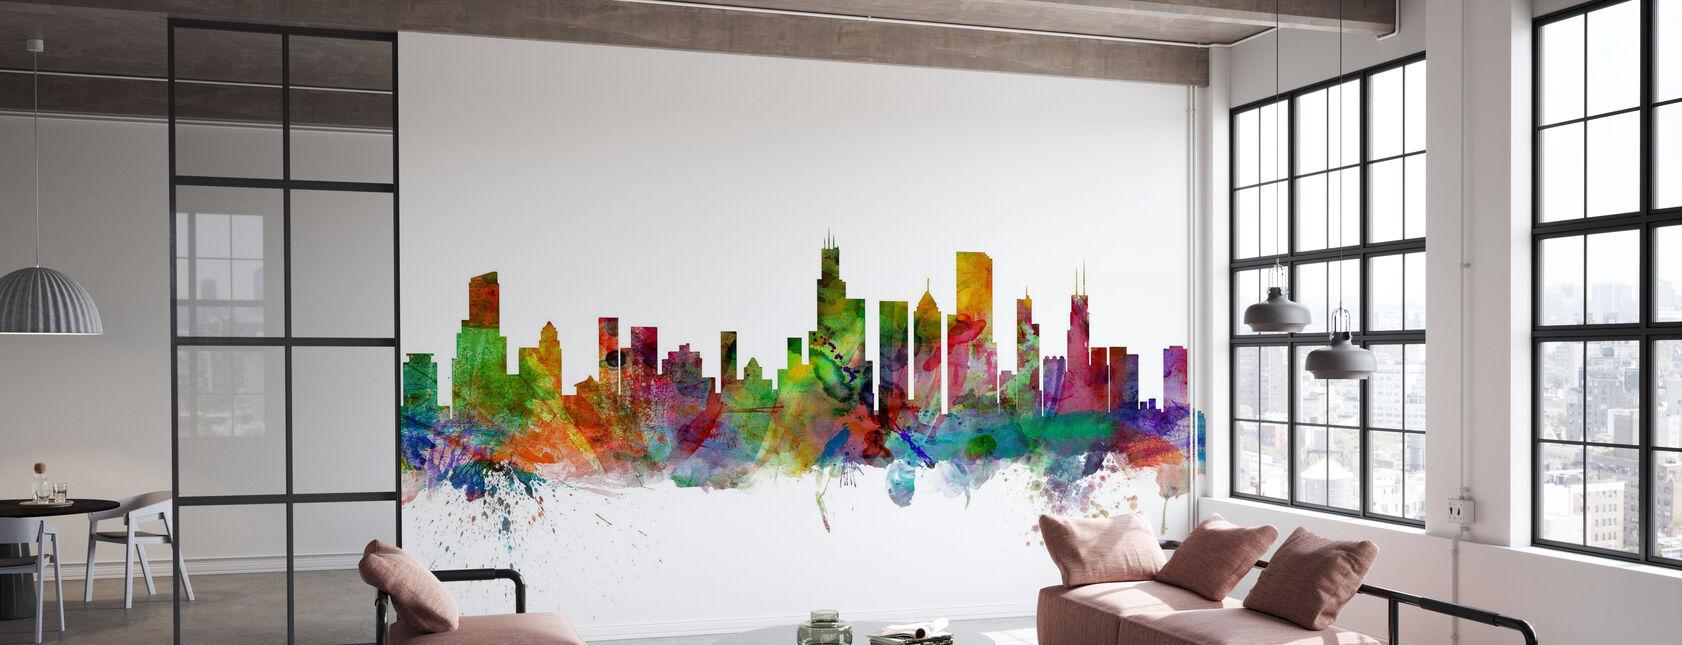 Chicago Skyline - Wallpaper - Office